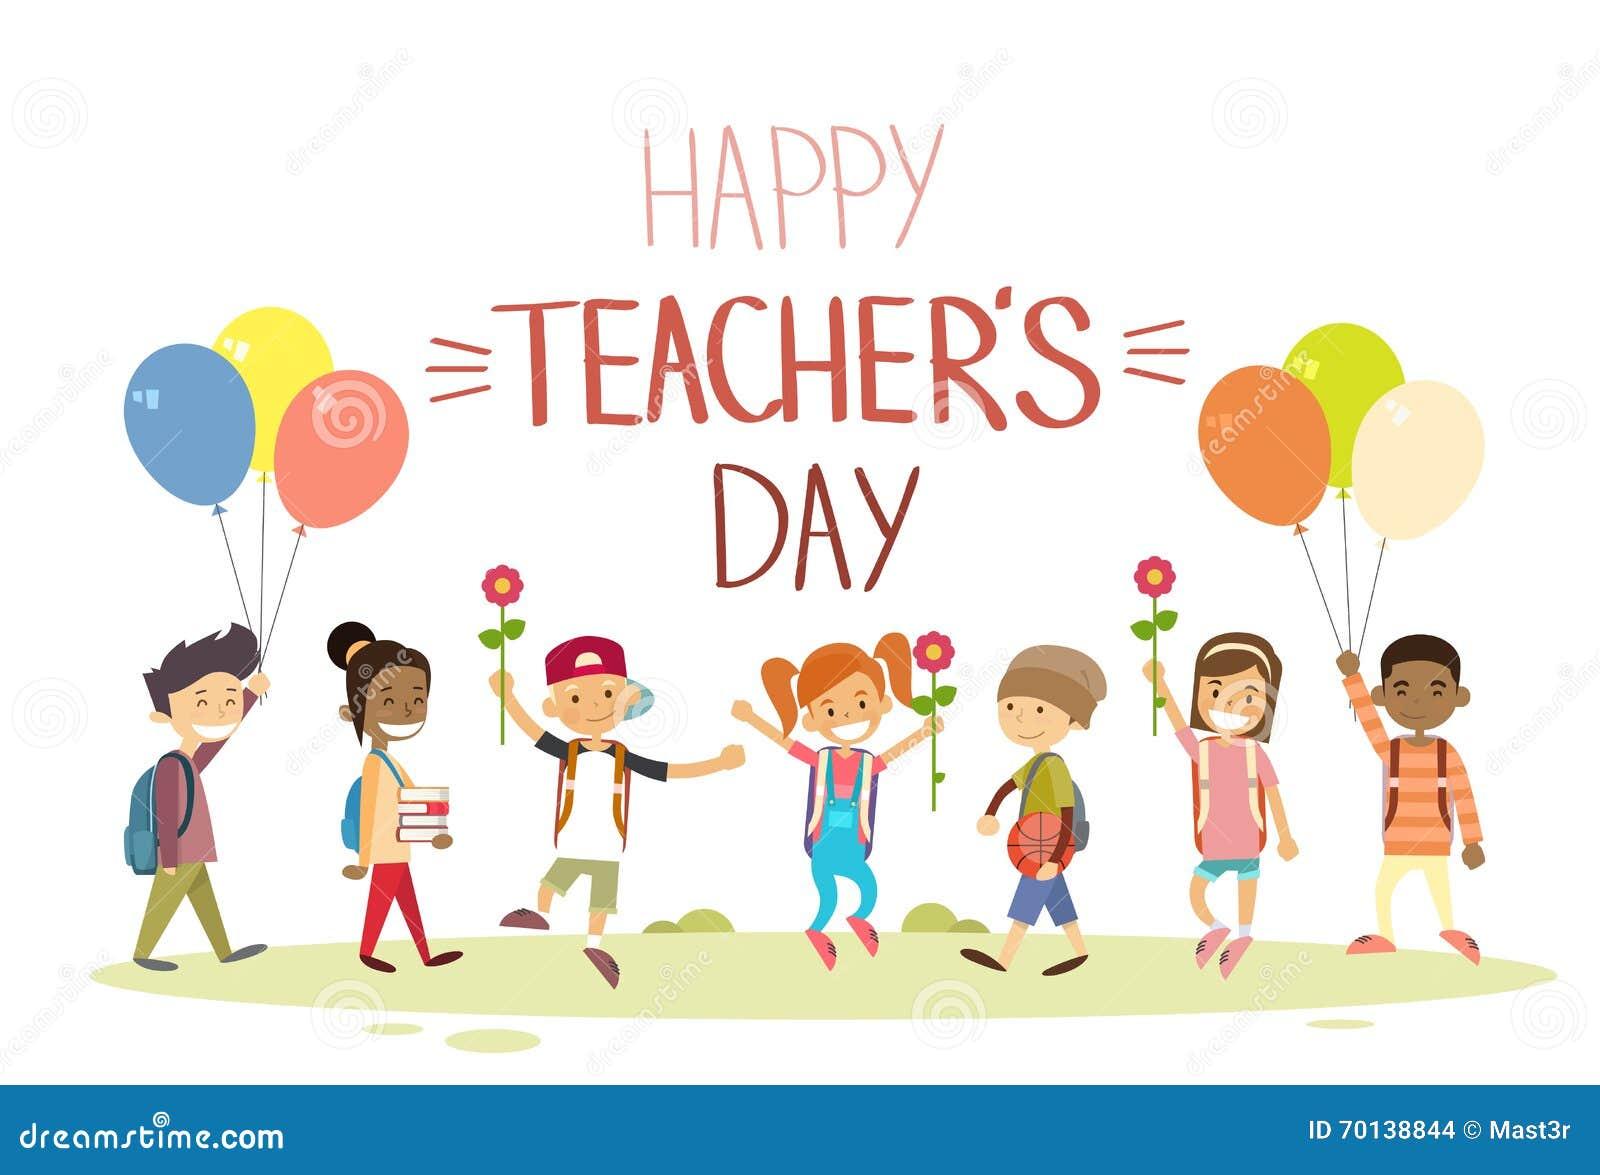 teenage christmas card photo ideas - Teacher Day School Children Group Hold Flowers Balloons